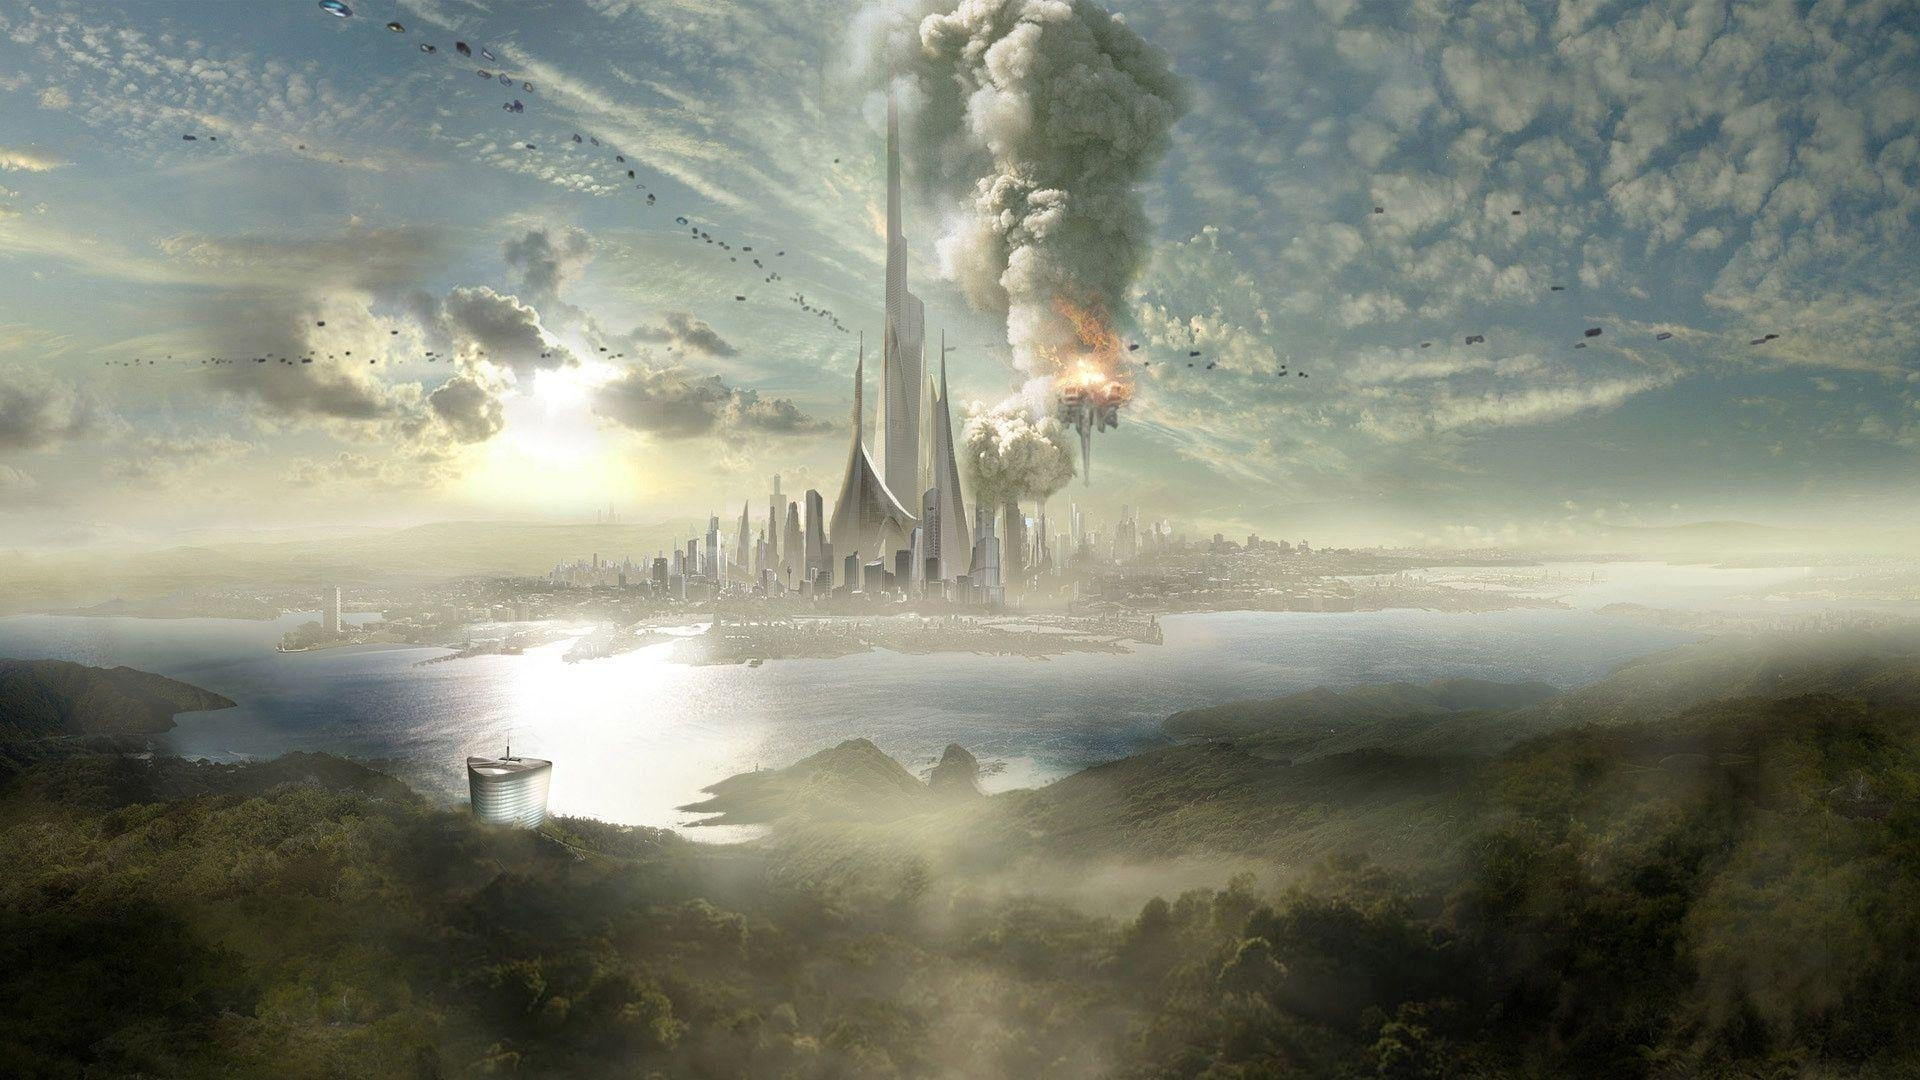 sci fi fantasy wallpapers - wallpaper cave